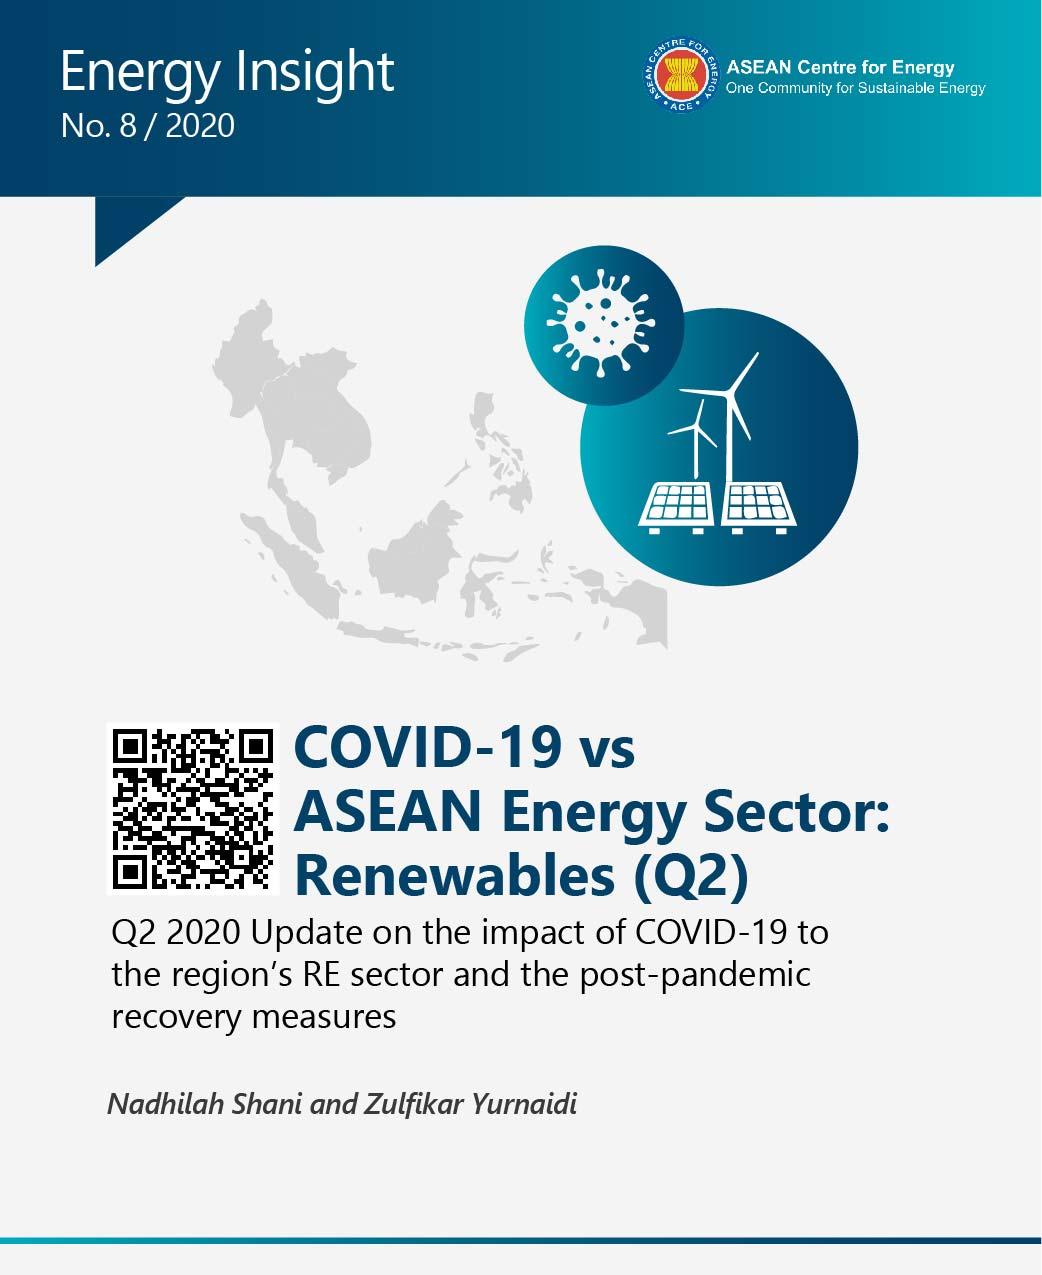 Q2 COVID-19 vs ASEAN Energy Sector: Renewables